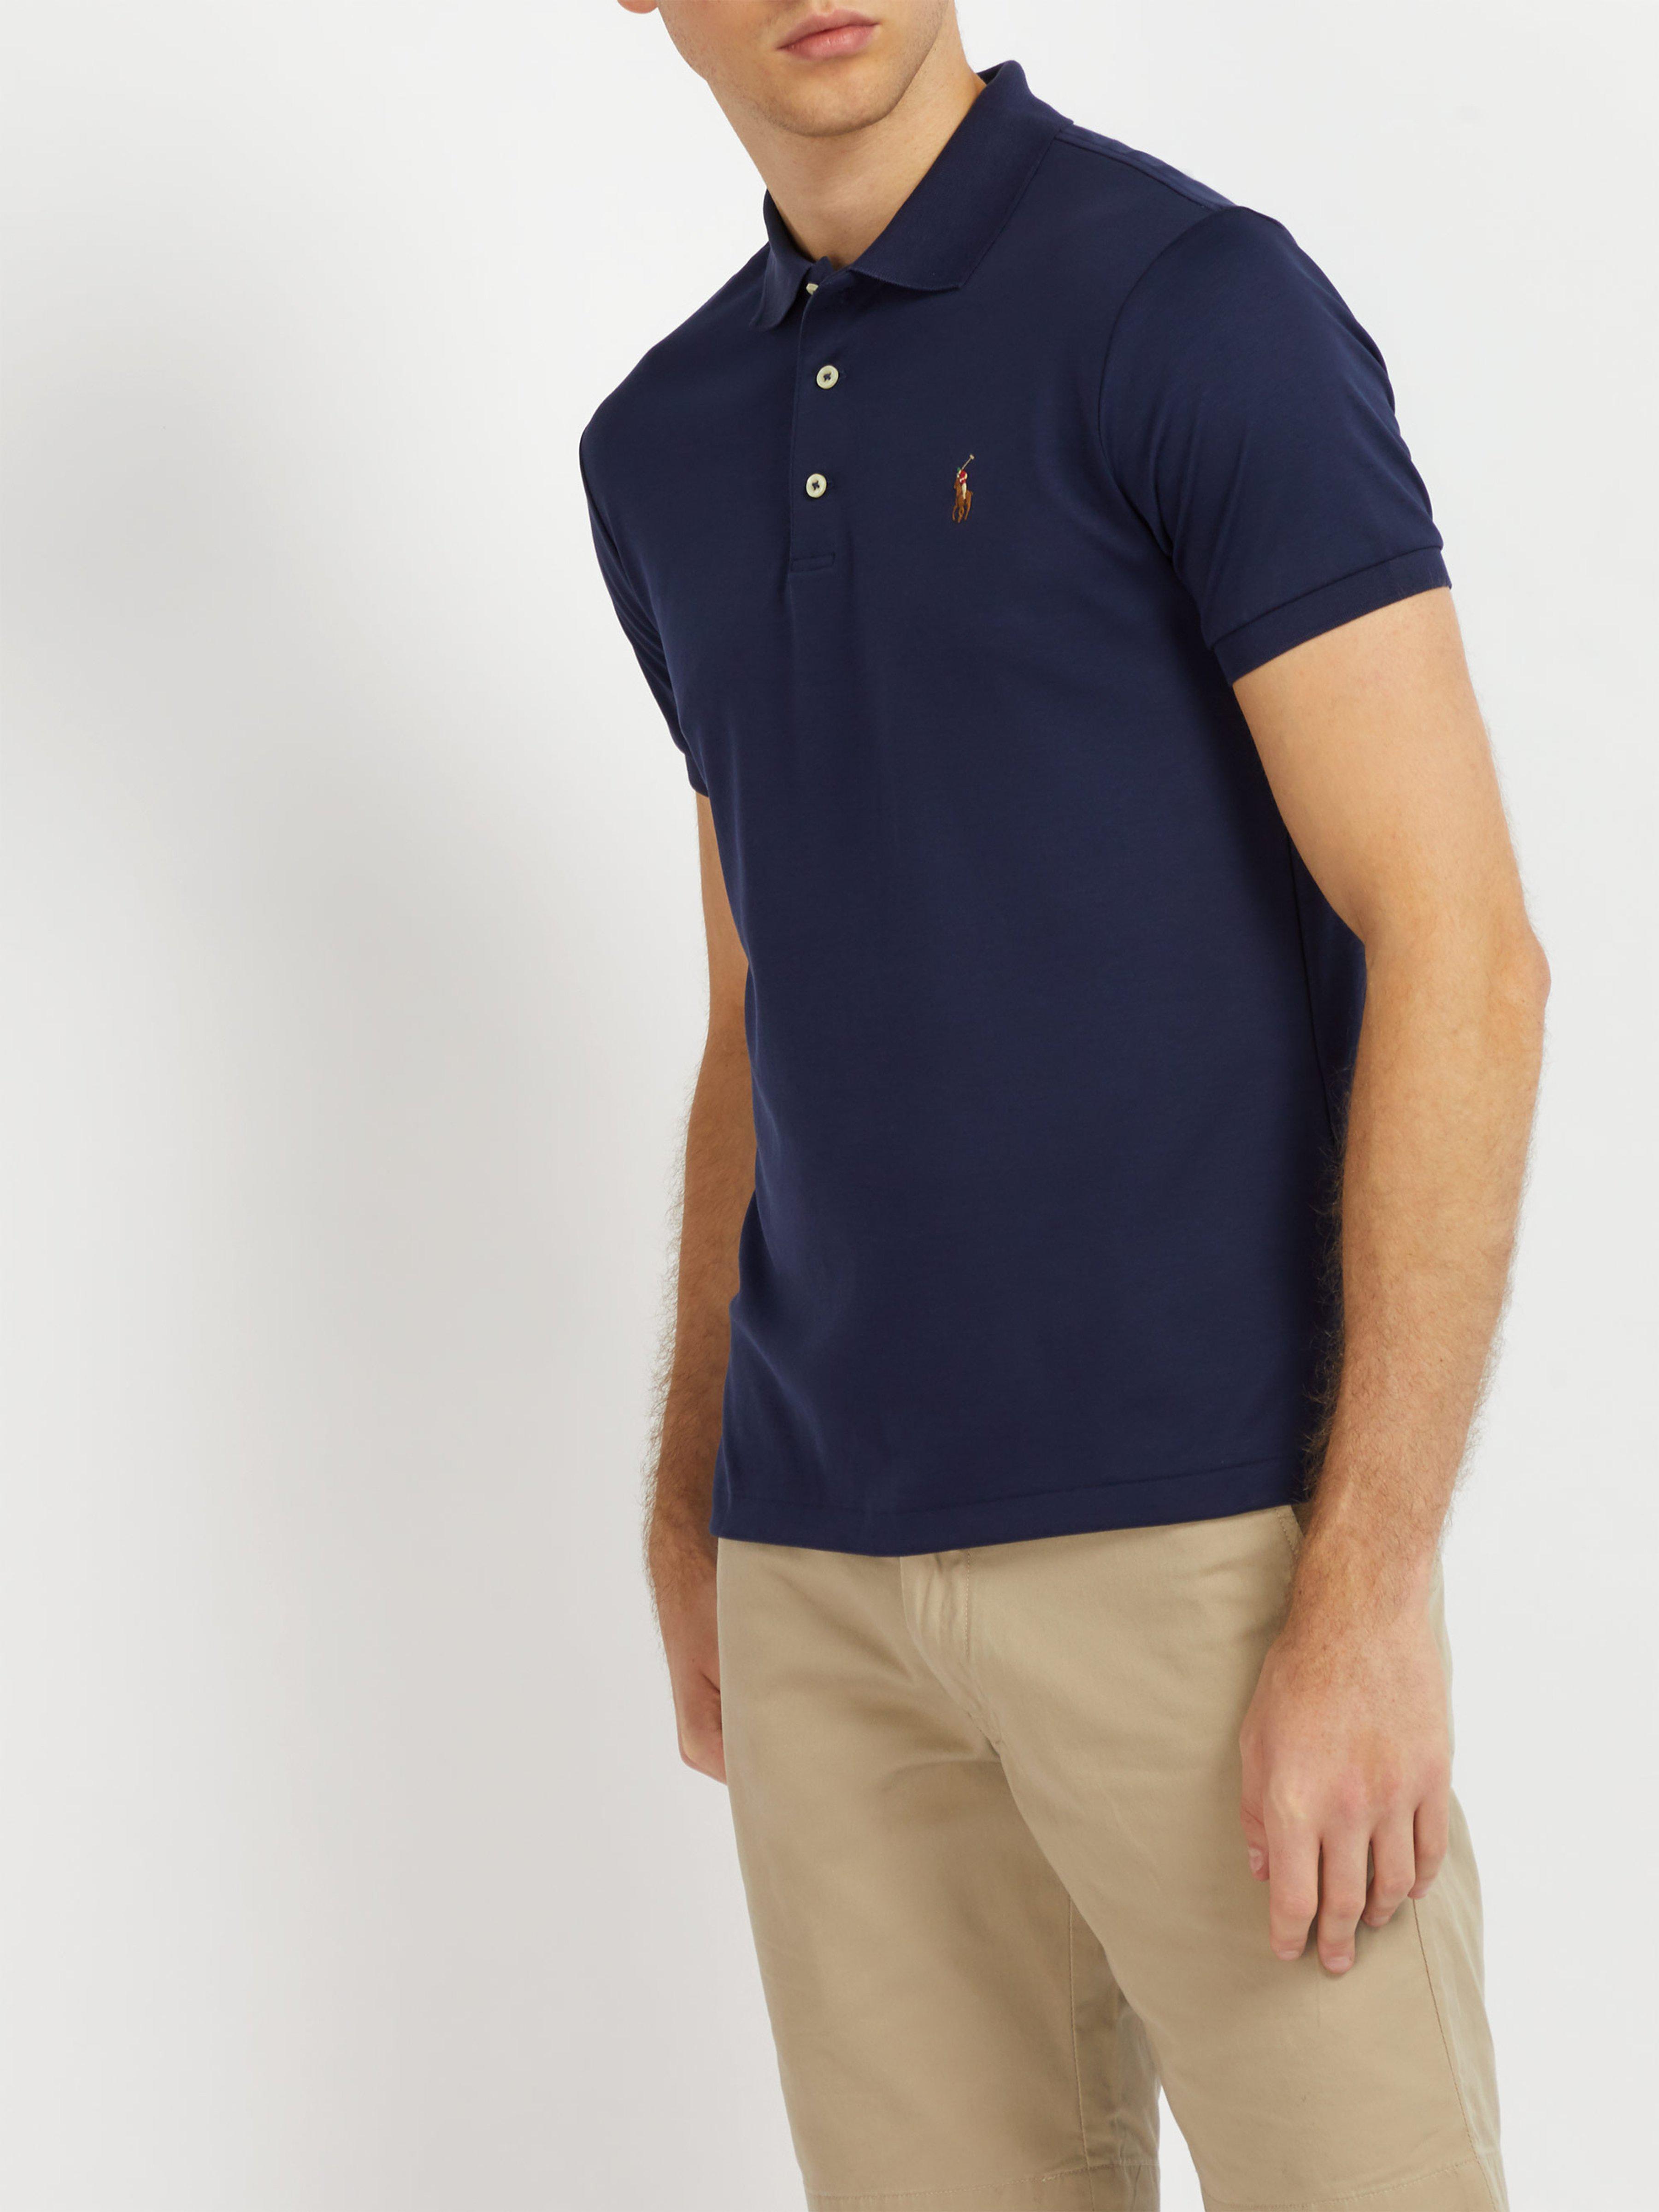 864fcba1 Polo Ralph Lauren Slim Fit Cotton Polo Shirt in Blue for Men - Lyst